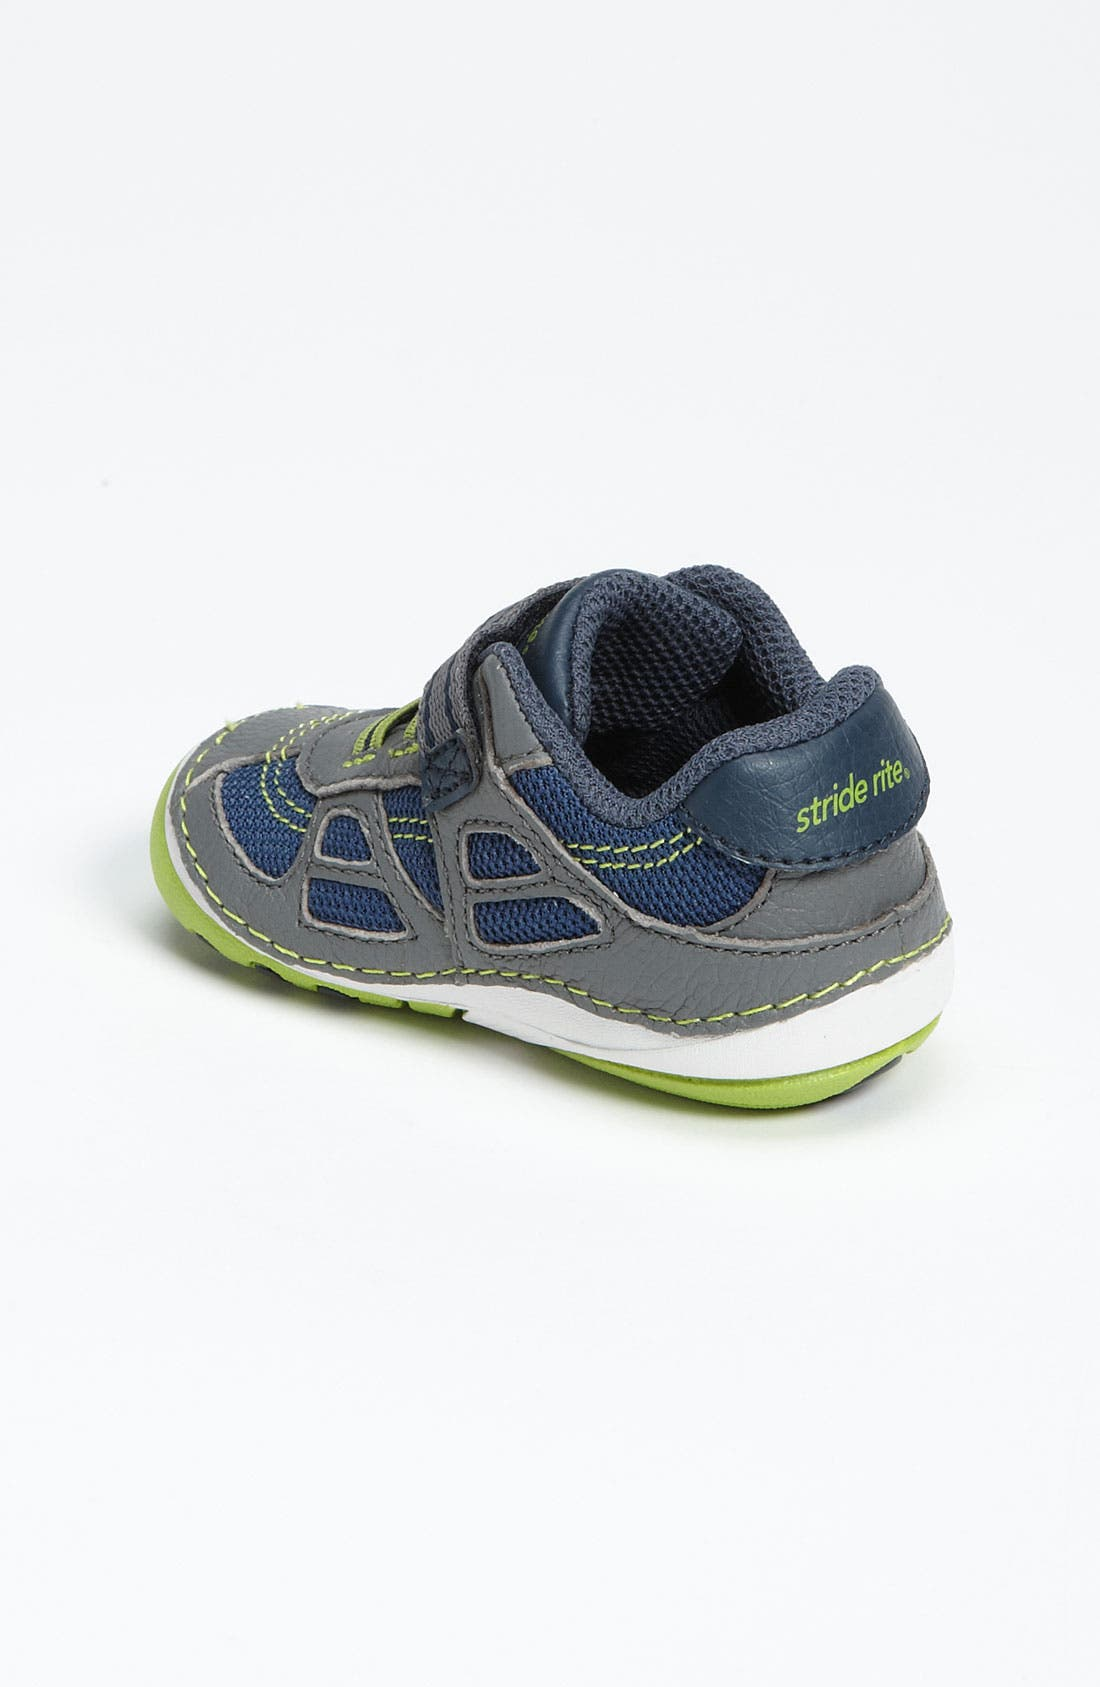 Alternate Image 2  - Stride Rite 'Conner' Sneaker (Baby & Walker)